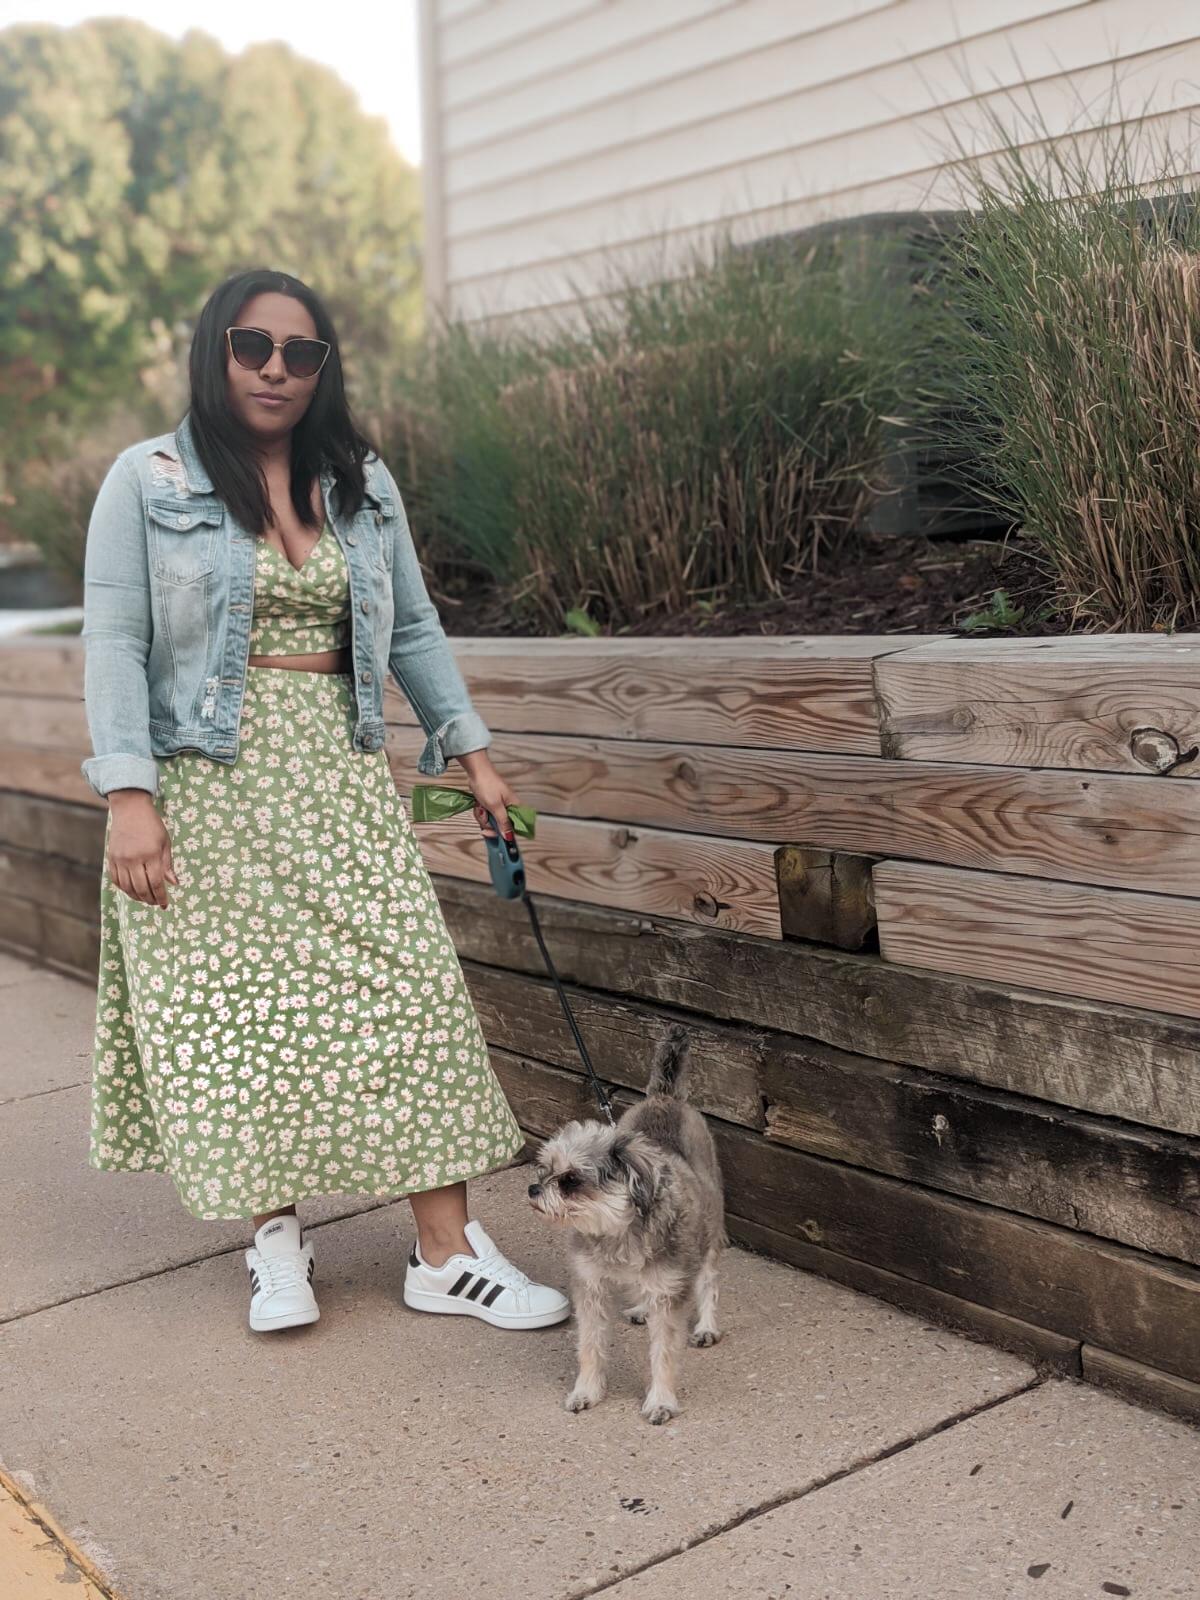 walking your dog fashion, quarintine fashion, spring outfits, pattys kloset, shein, shein reviews, two piece set